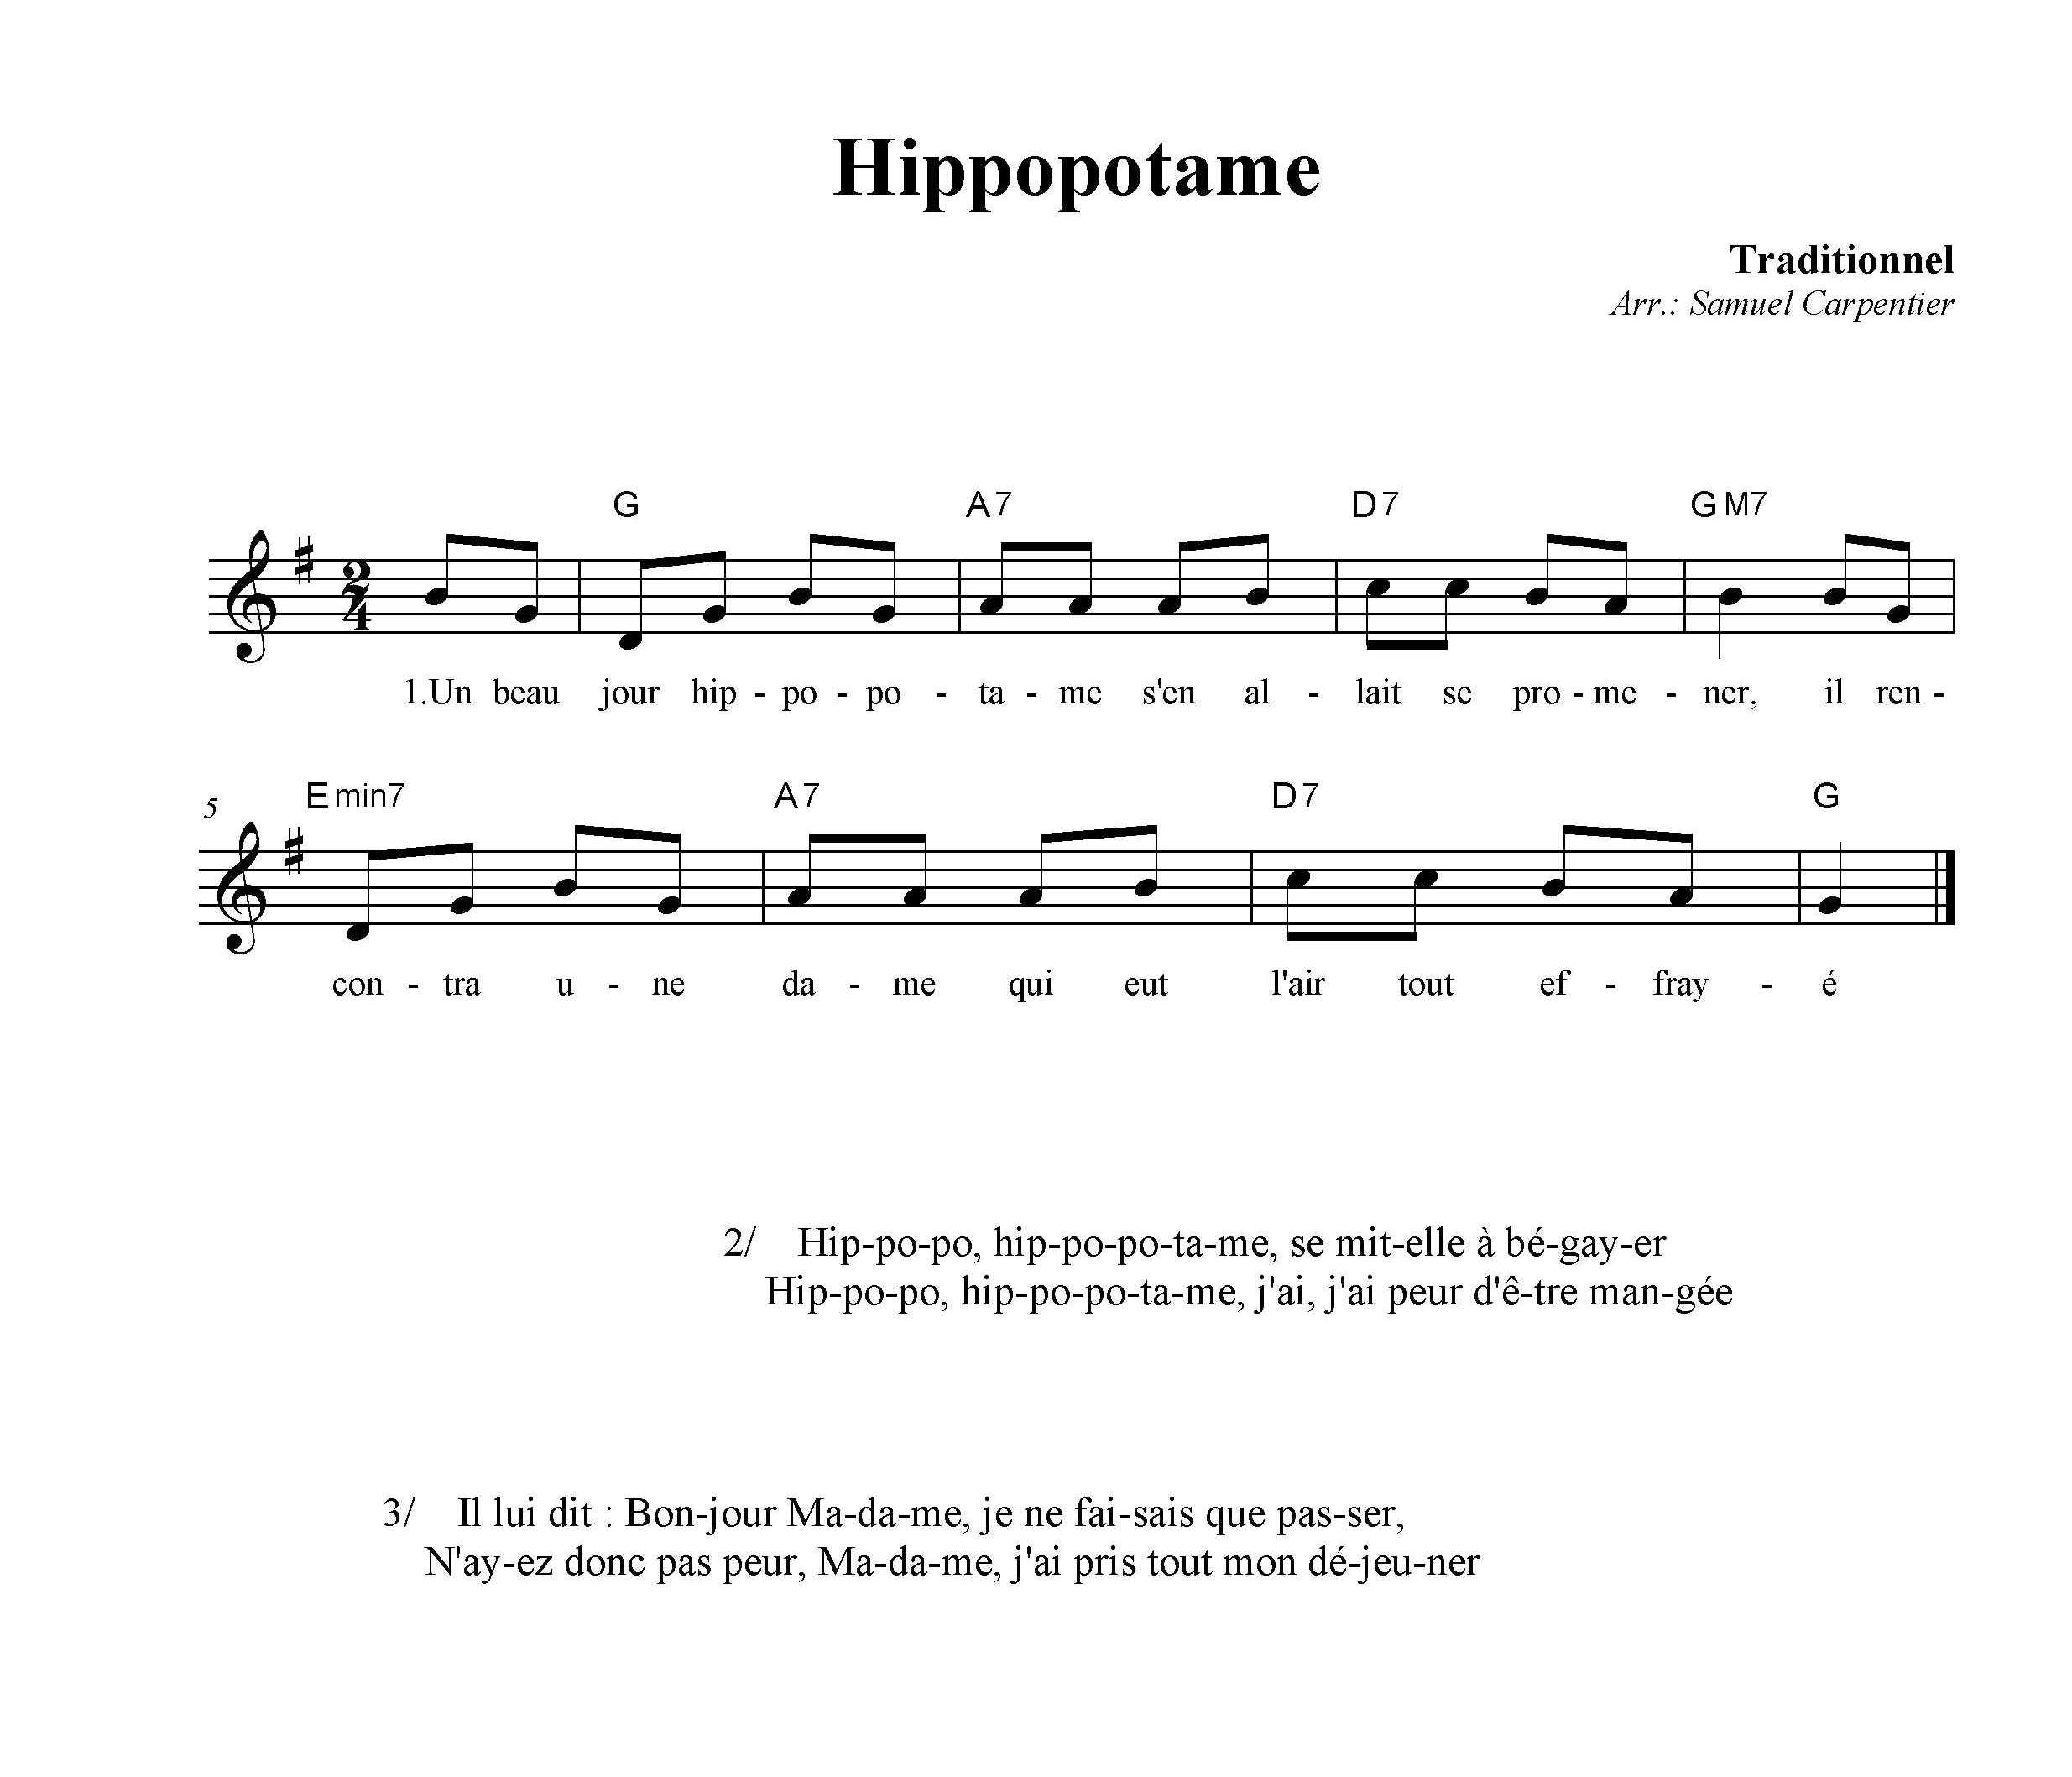 Chanson hippopotame - Je suis malade chanson ...